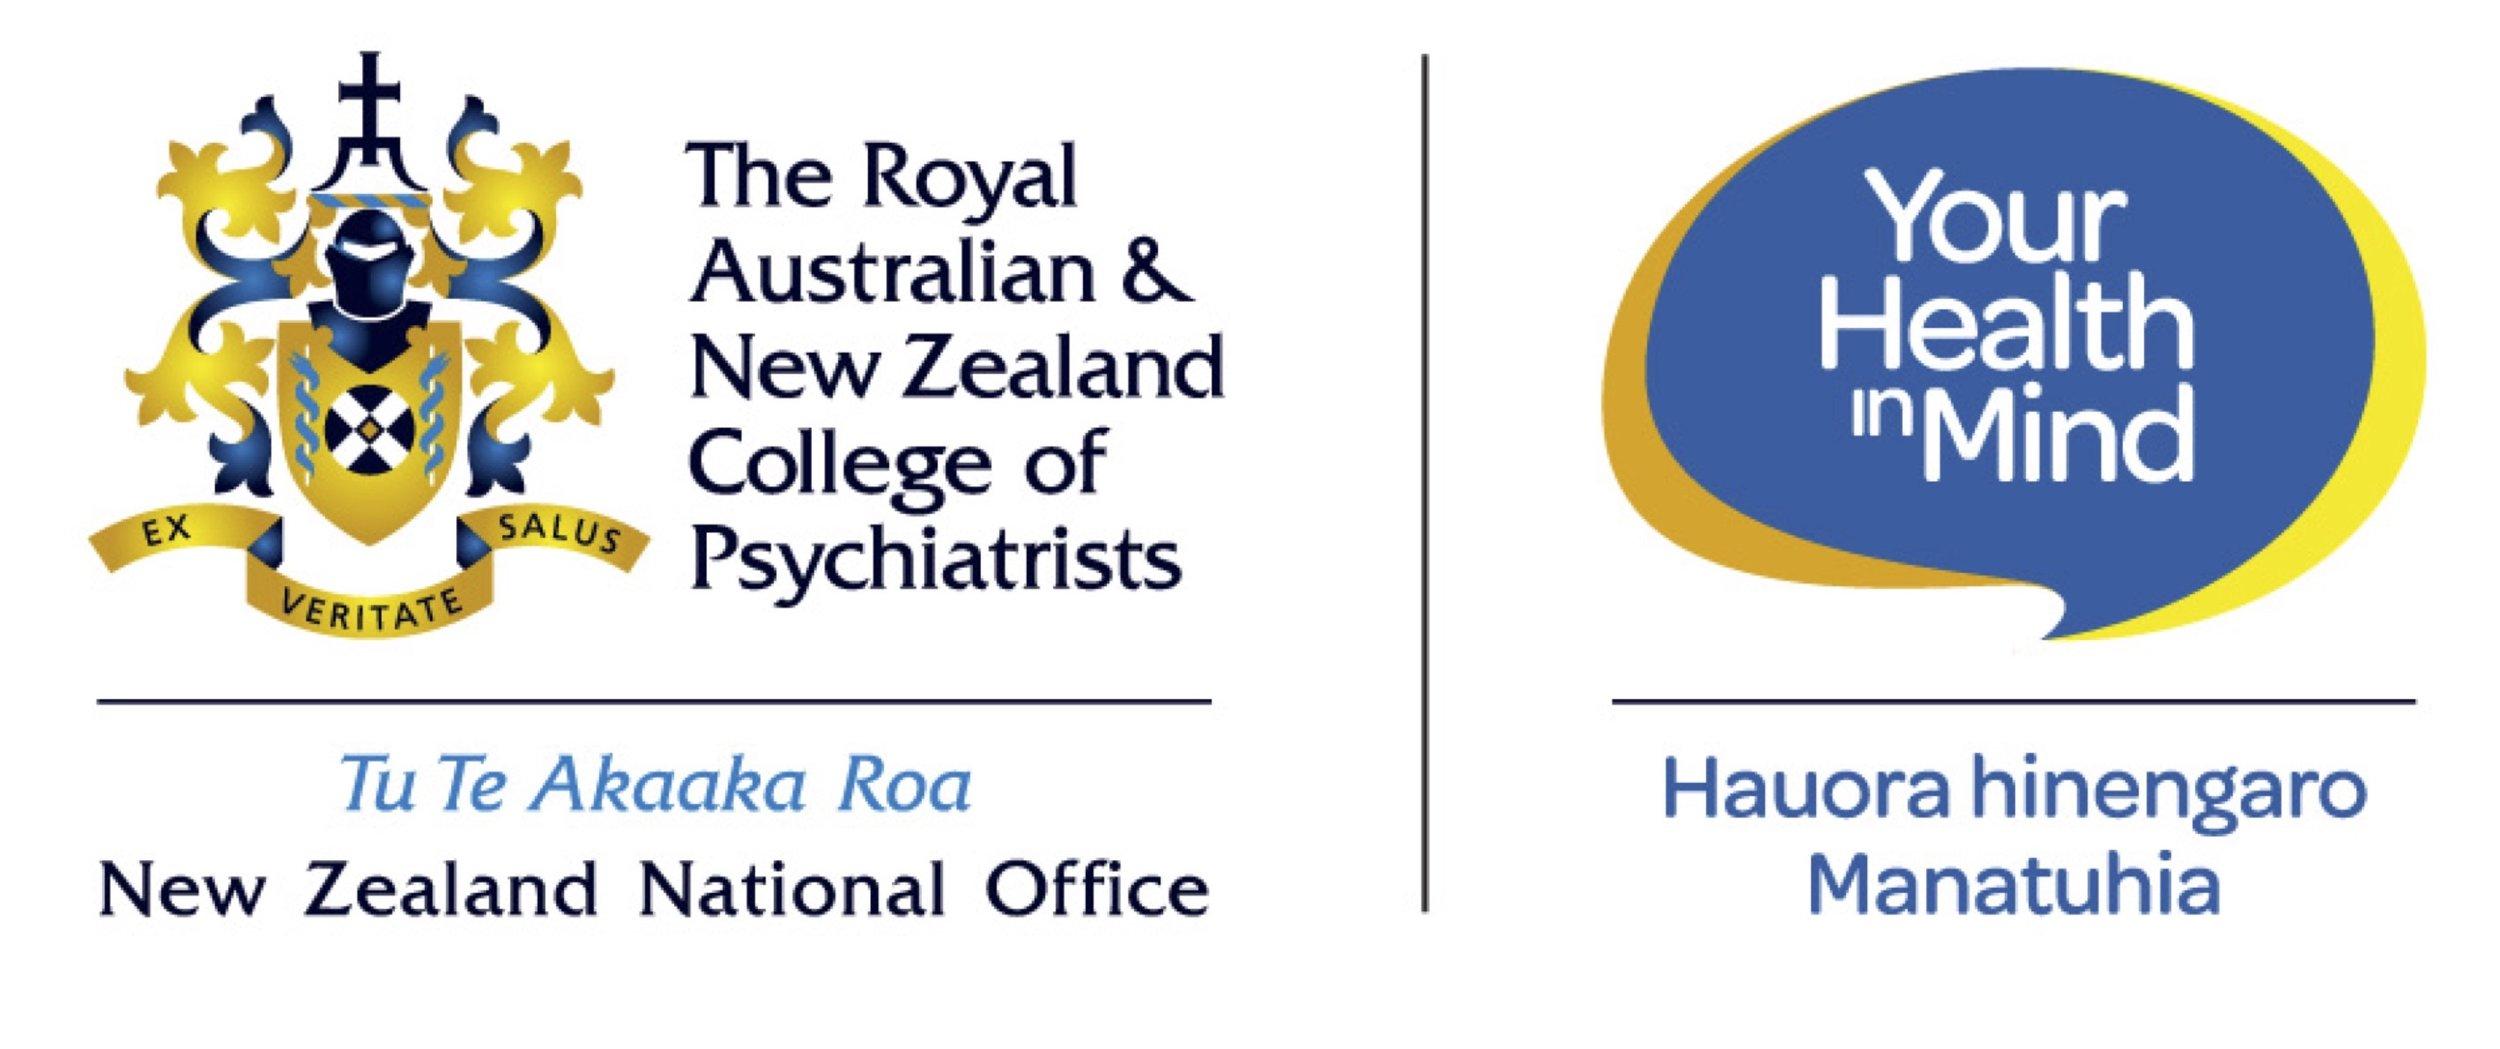 RANZCP NZ COLOUR Horizontal.jpg